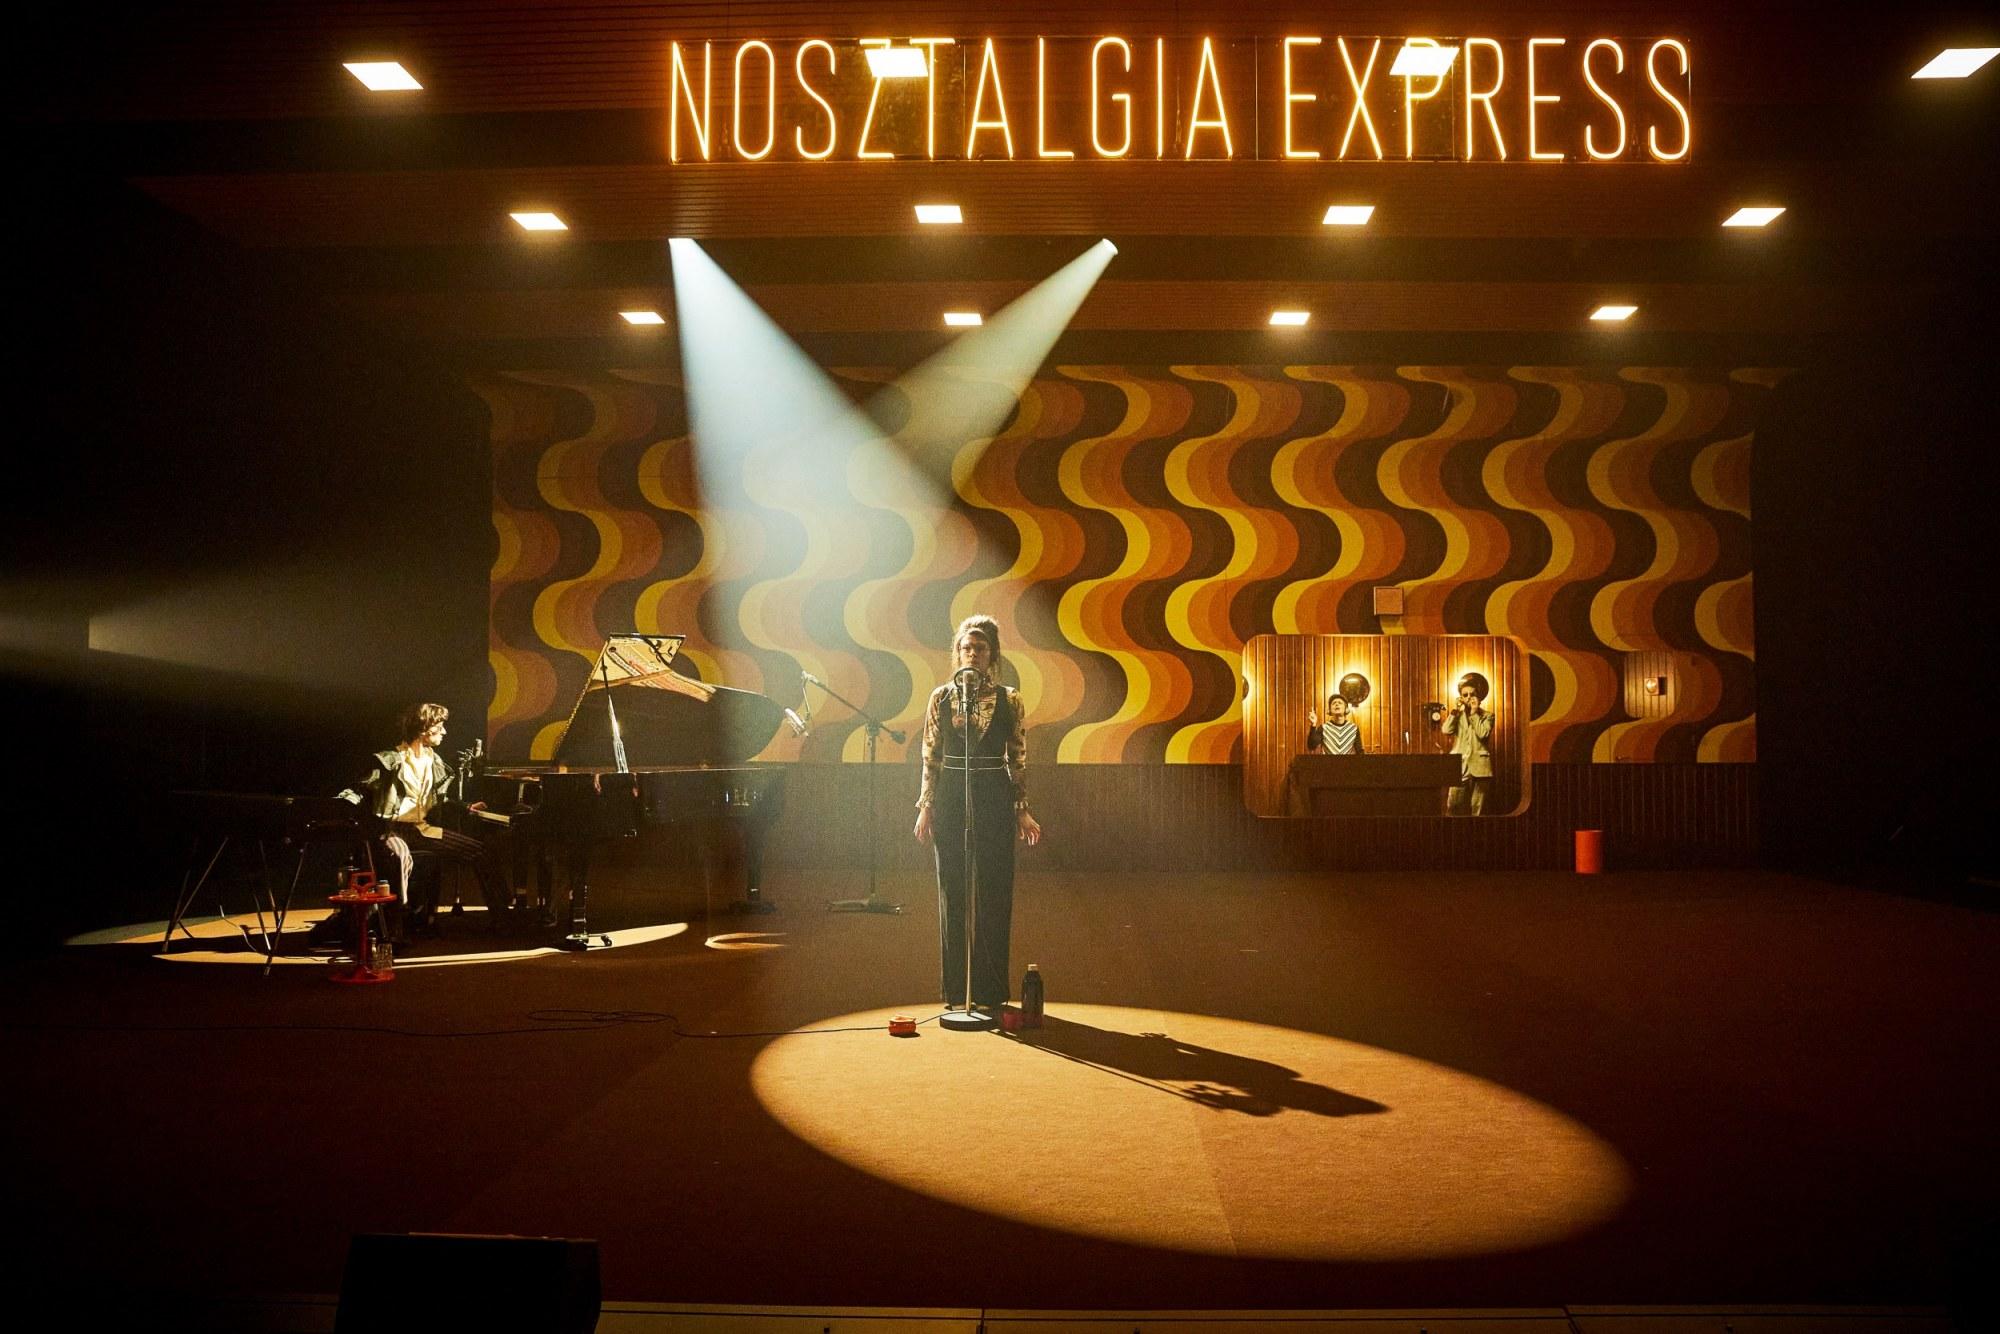 Nosztalgia Express © Christophe Raynaud de Lage